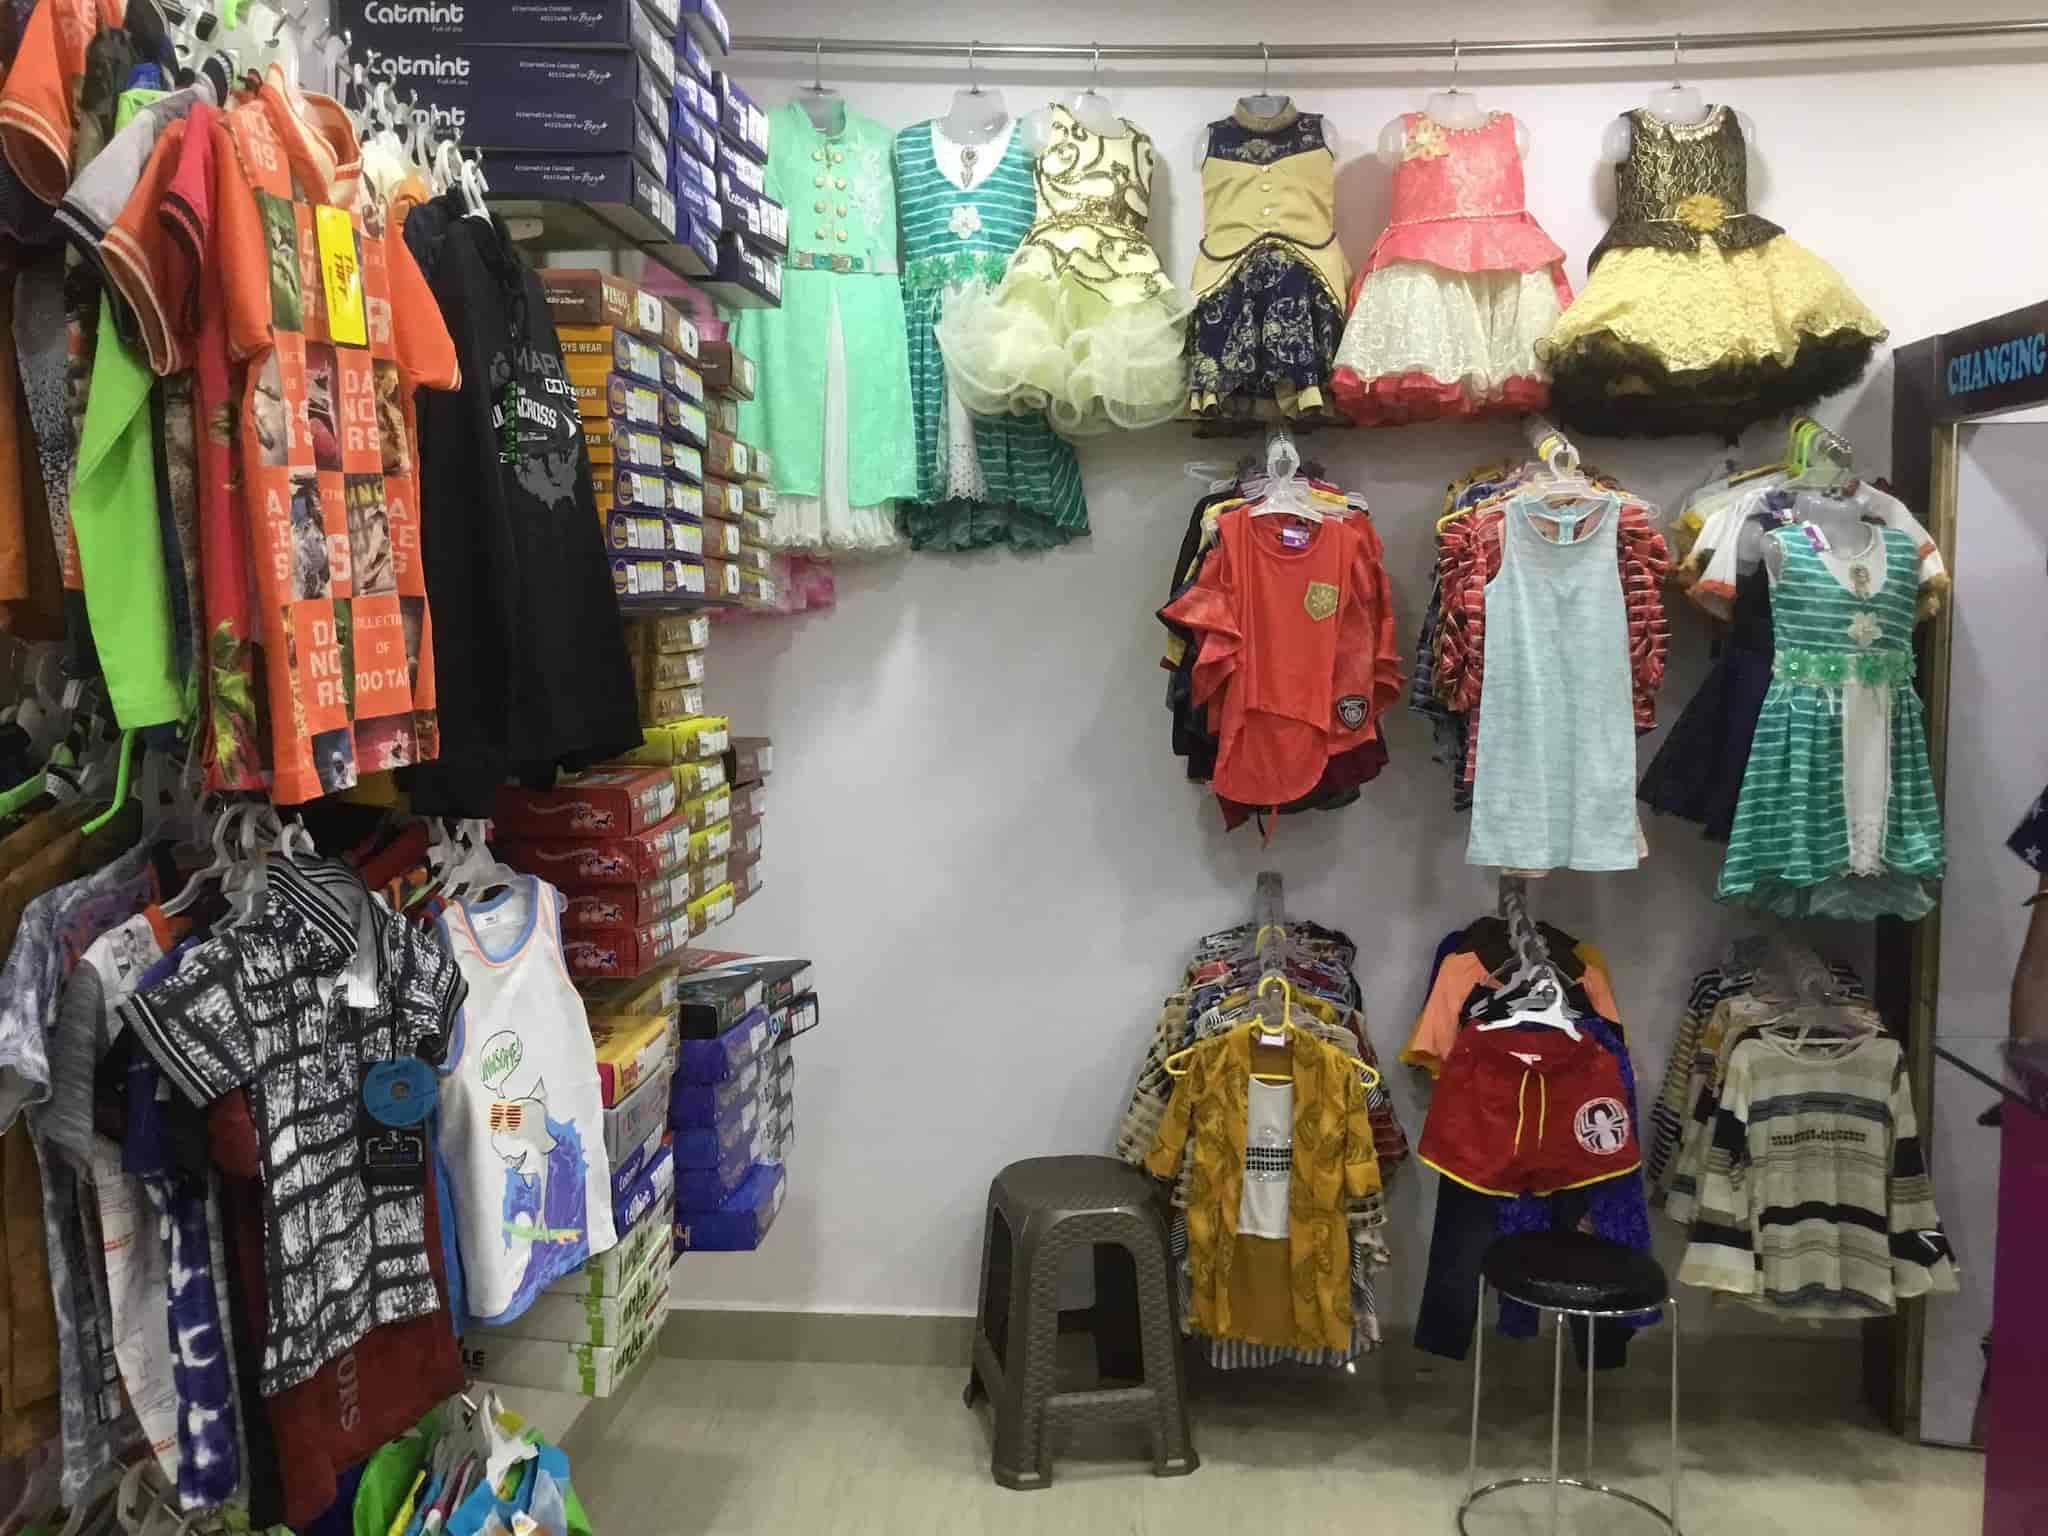 96e5579e52b691 ... Kinder Kids Western Store Photos